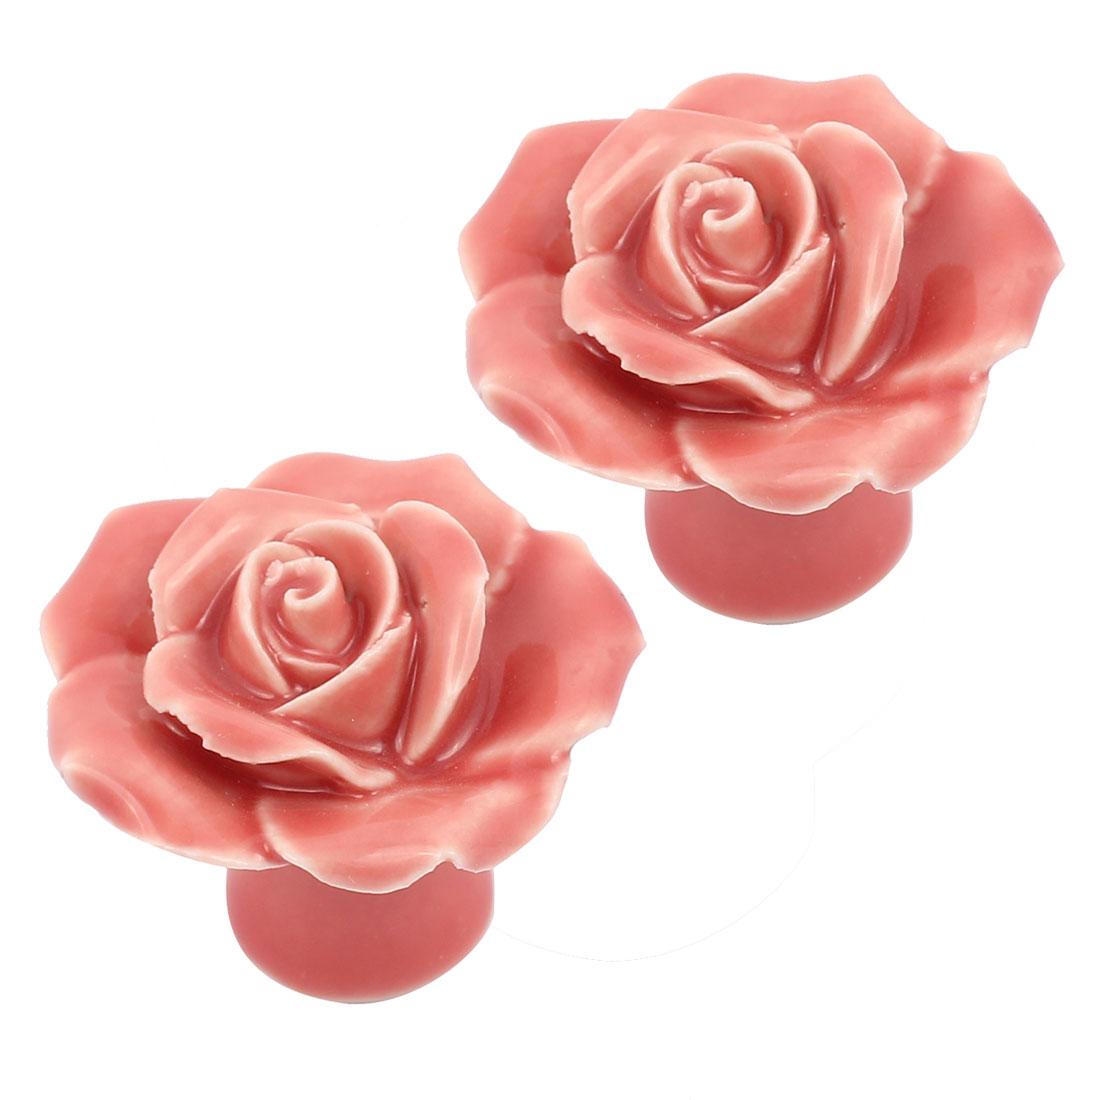 Cabinet Wardrobe Drawer Door Pull Rose Shape Design Ceramic Knobs Pink 2pcs